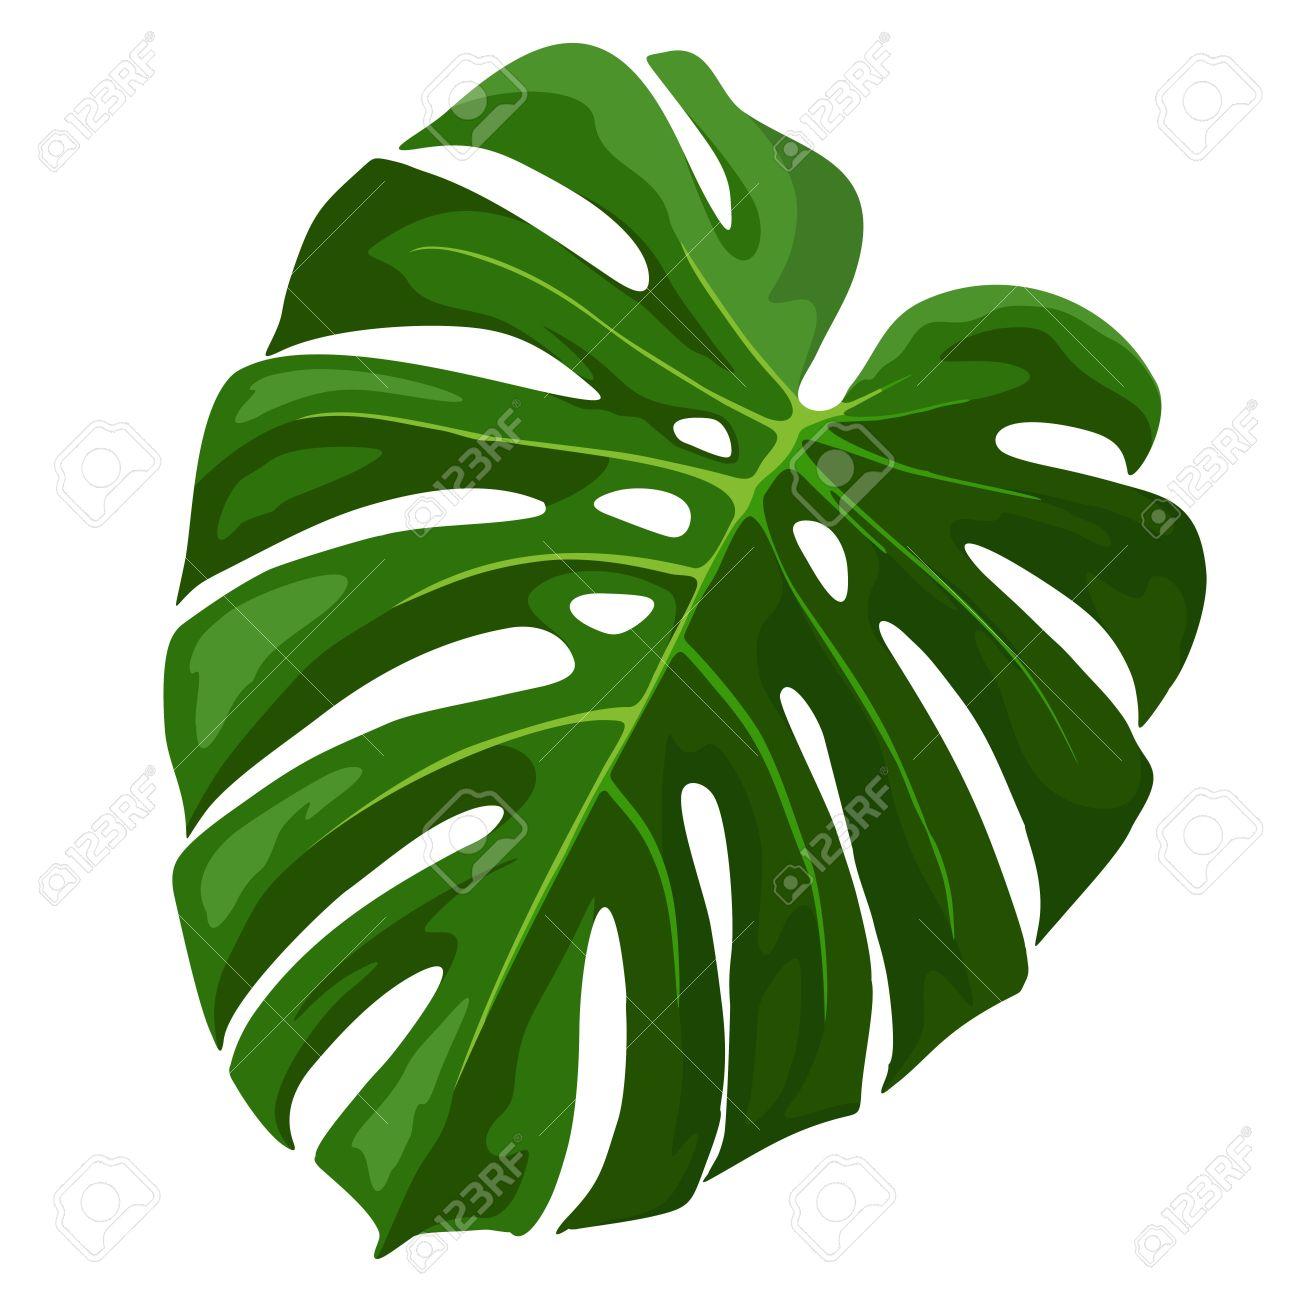 Tropical leaf clipart jpg black and white Tropical Leaves Clipart   Free download best Tropical Leaves ... jpg black and white